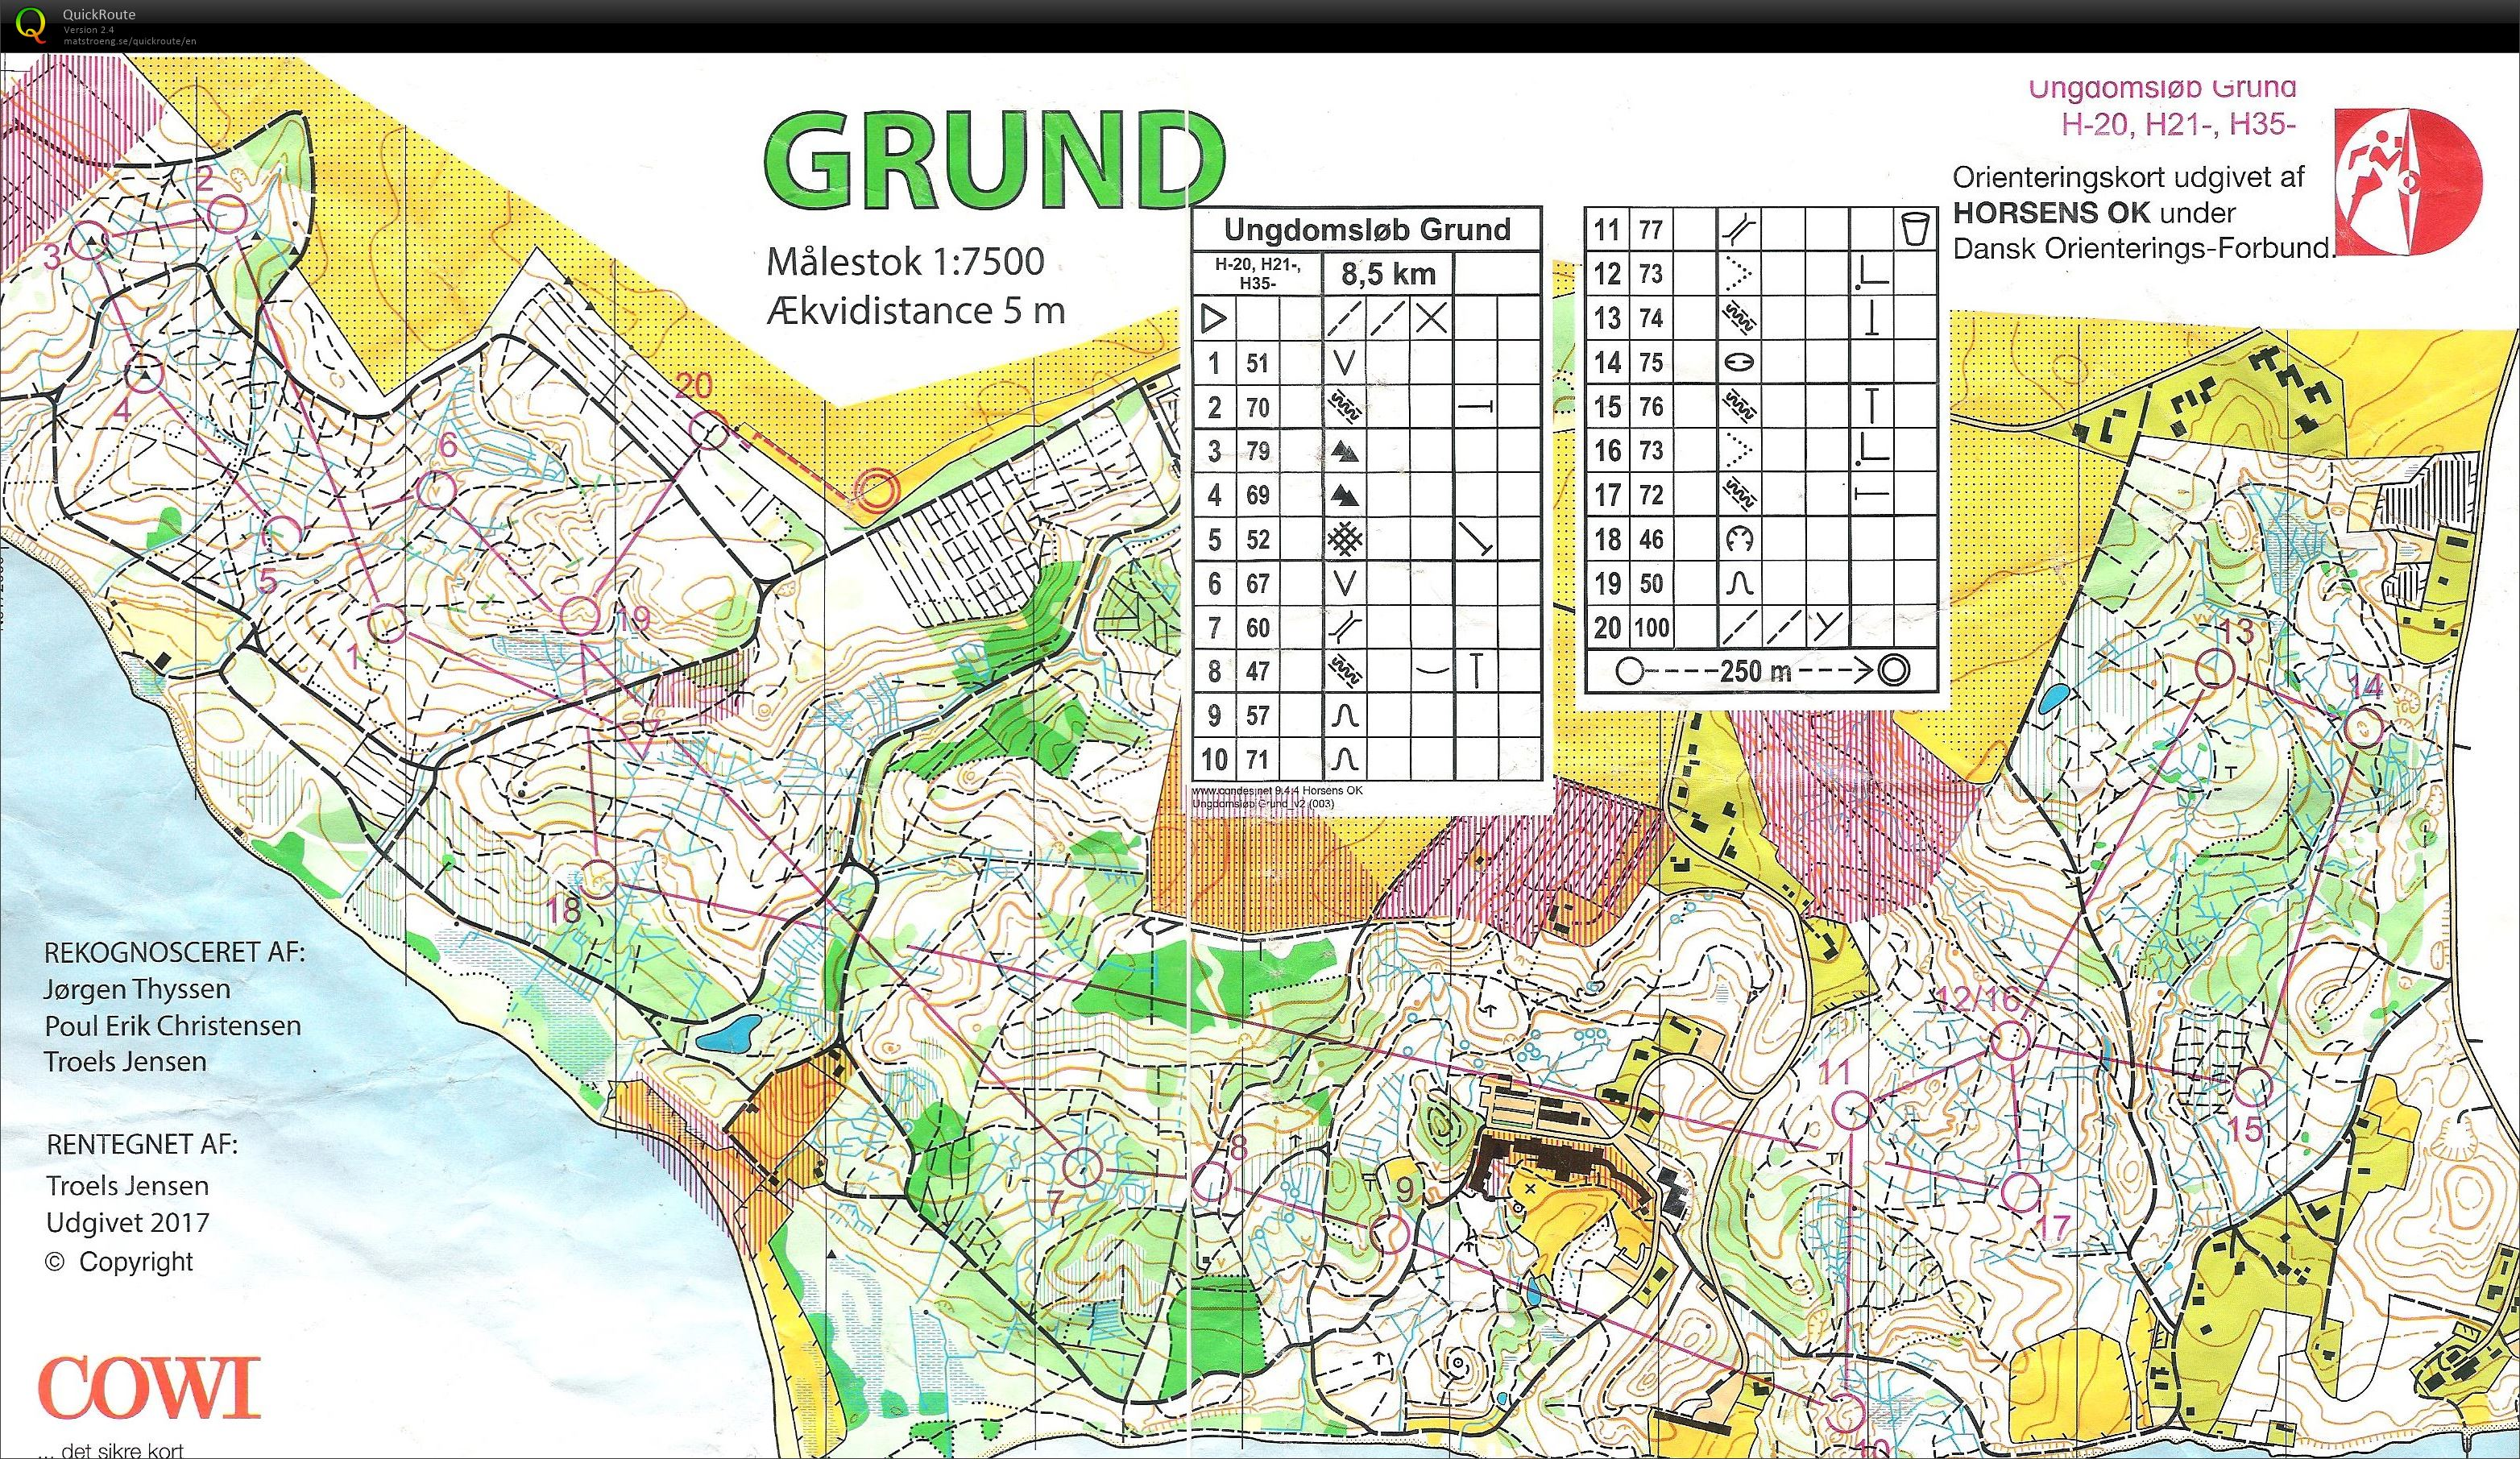 Grund H35 May 28th 2017 Orienteering Map From Jess Rasmussen